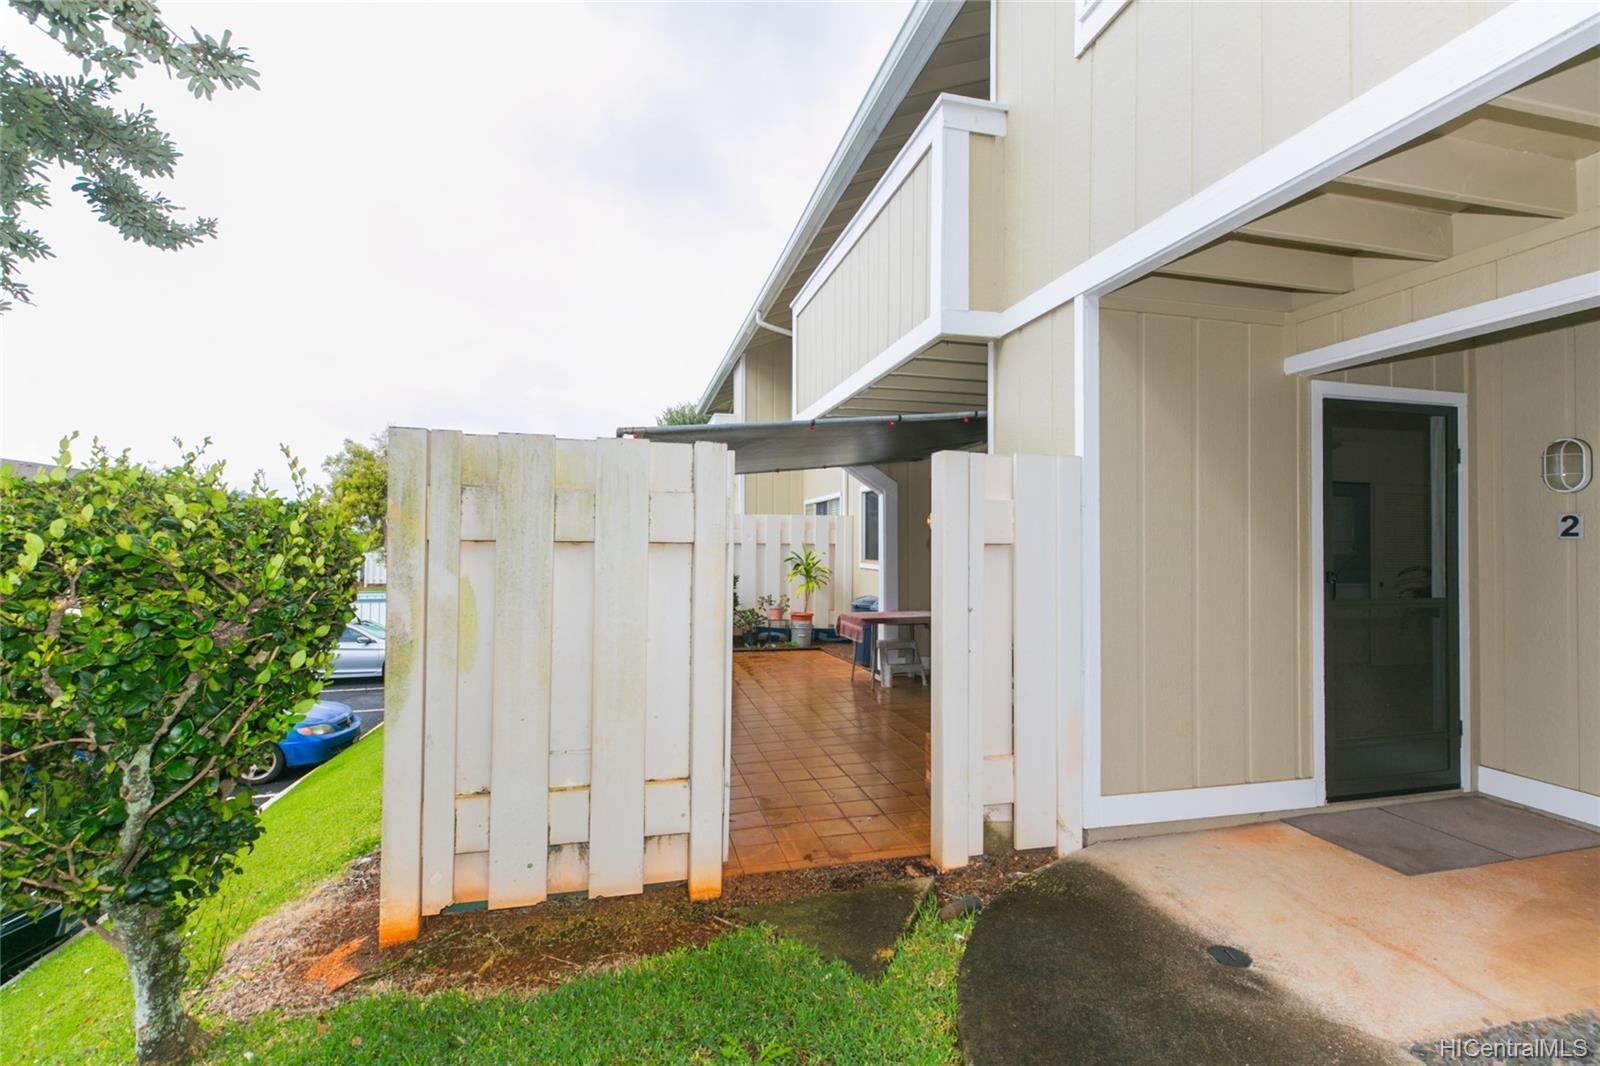 94-724 Paaono Street townhouse # Y2, Waipahu, Hawaii - photo 23 of 24